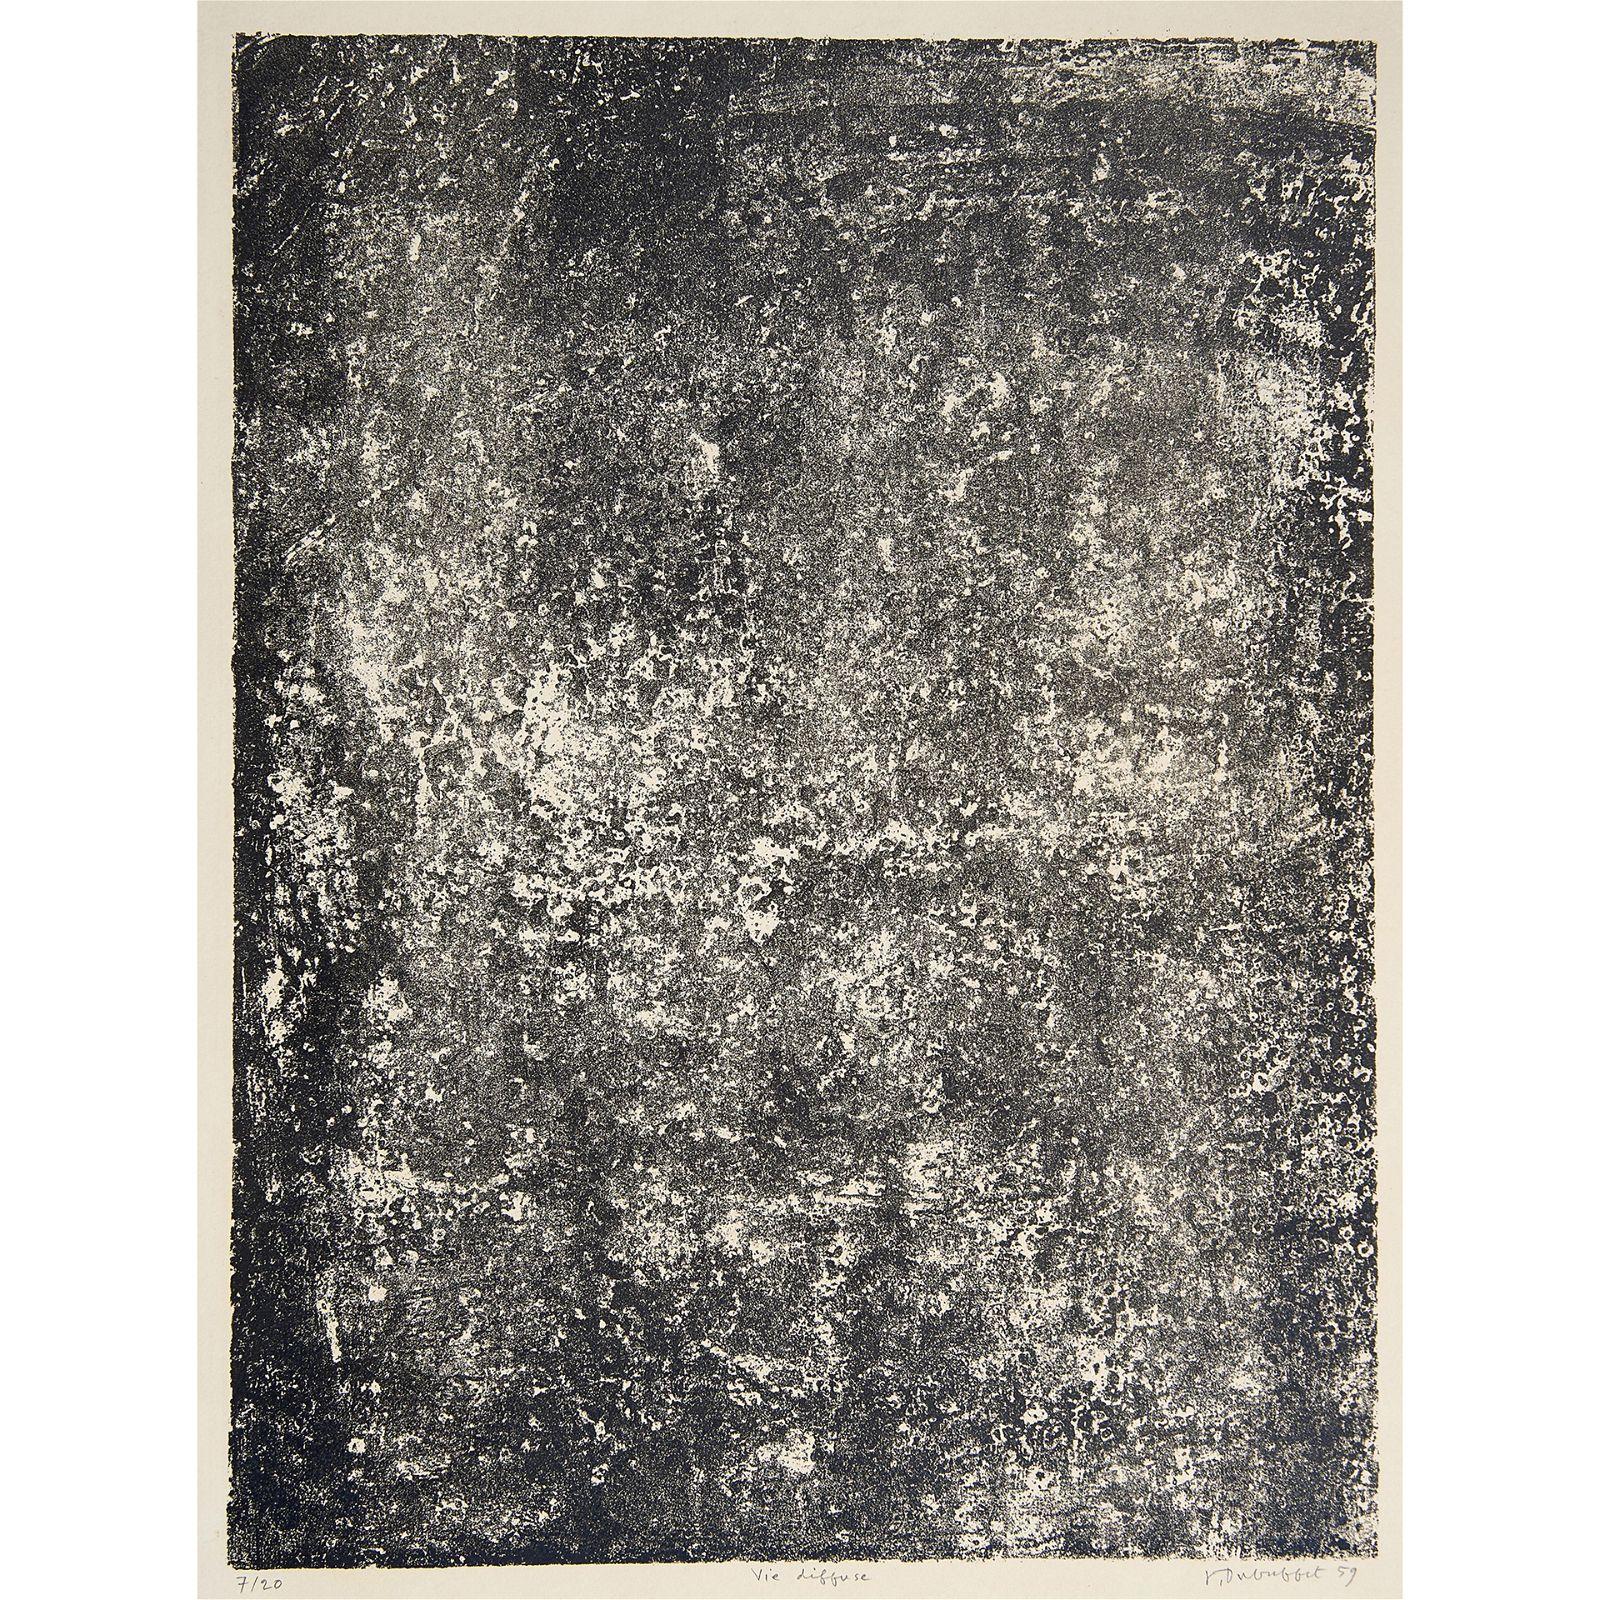 Print, Jean Dubuffet